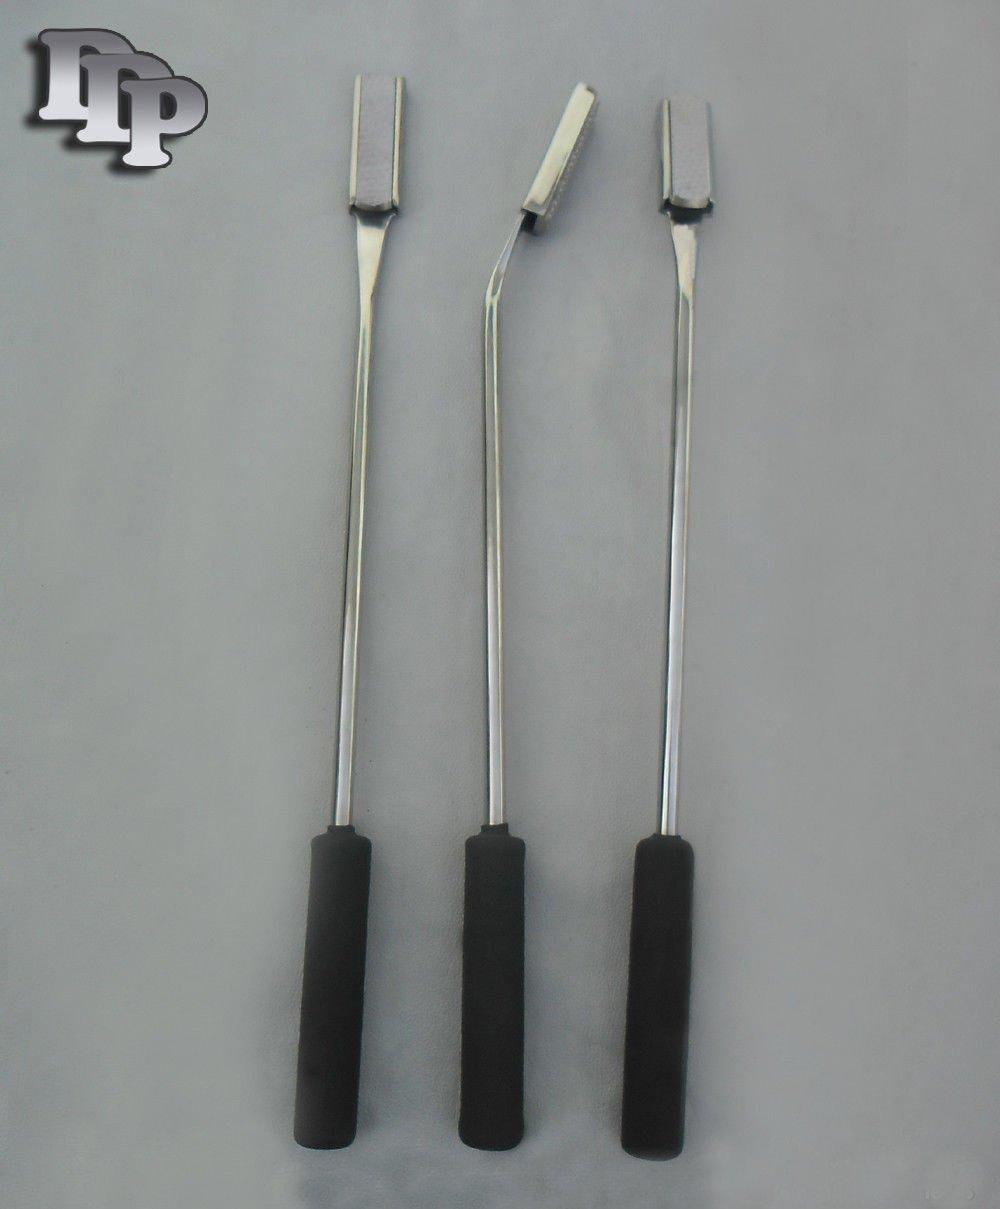 Set of 3 Equine Dental Float Rasp Str,down,up,veterinary DDP Instrments